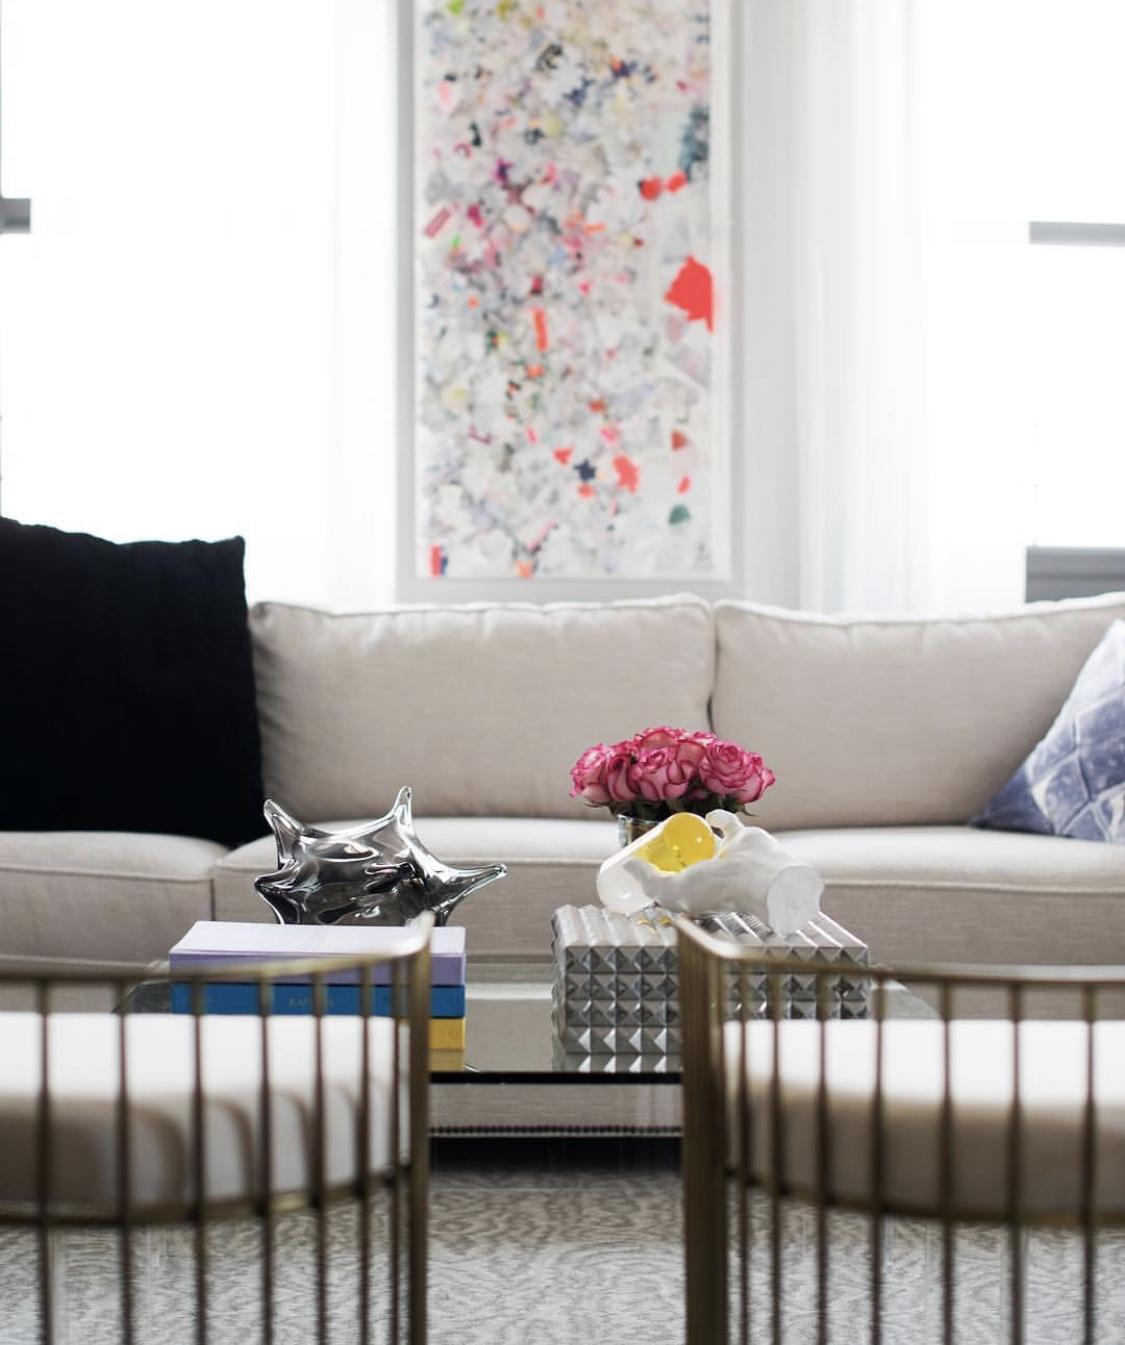 Kristi-Kohut-fine-art-in-homes-collector-reviews734.jpg